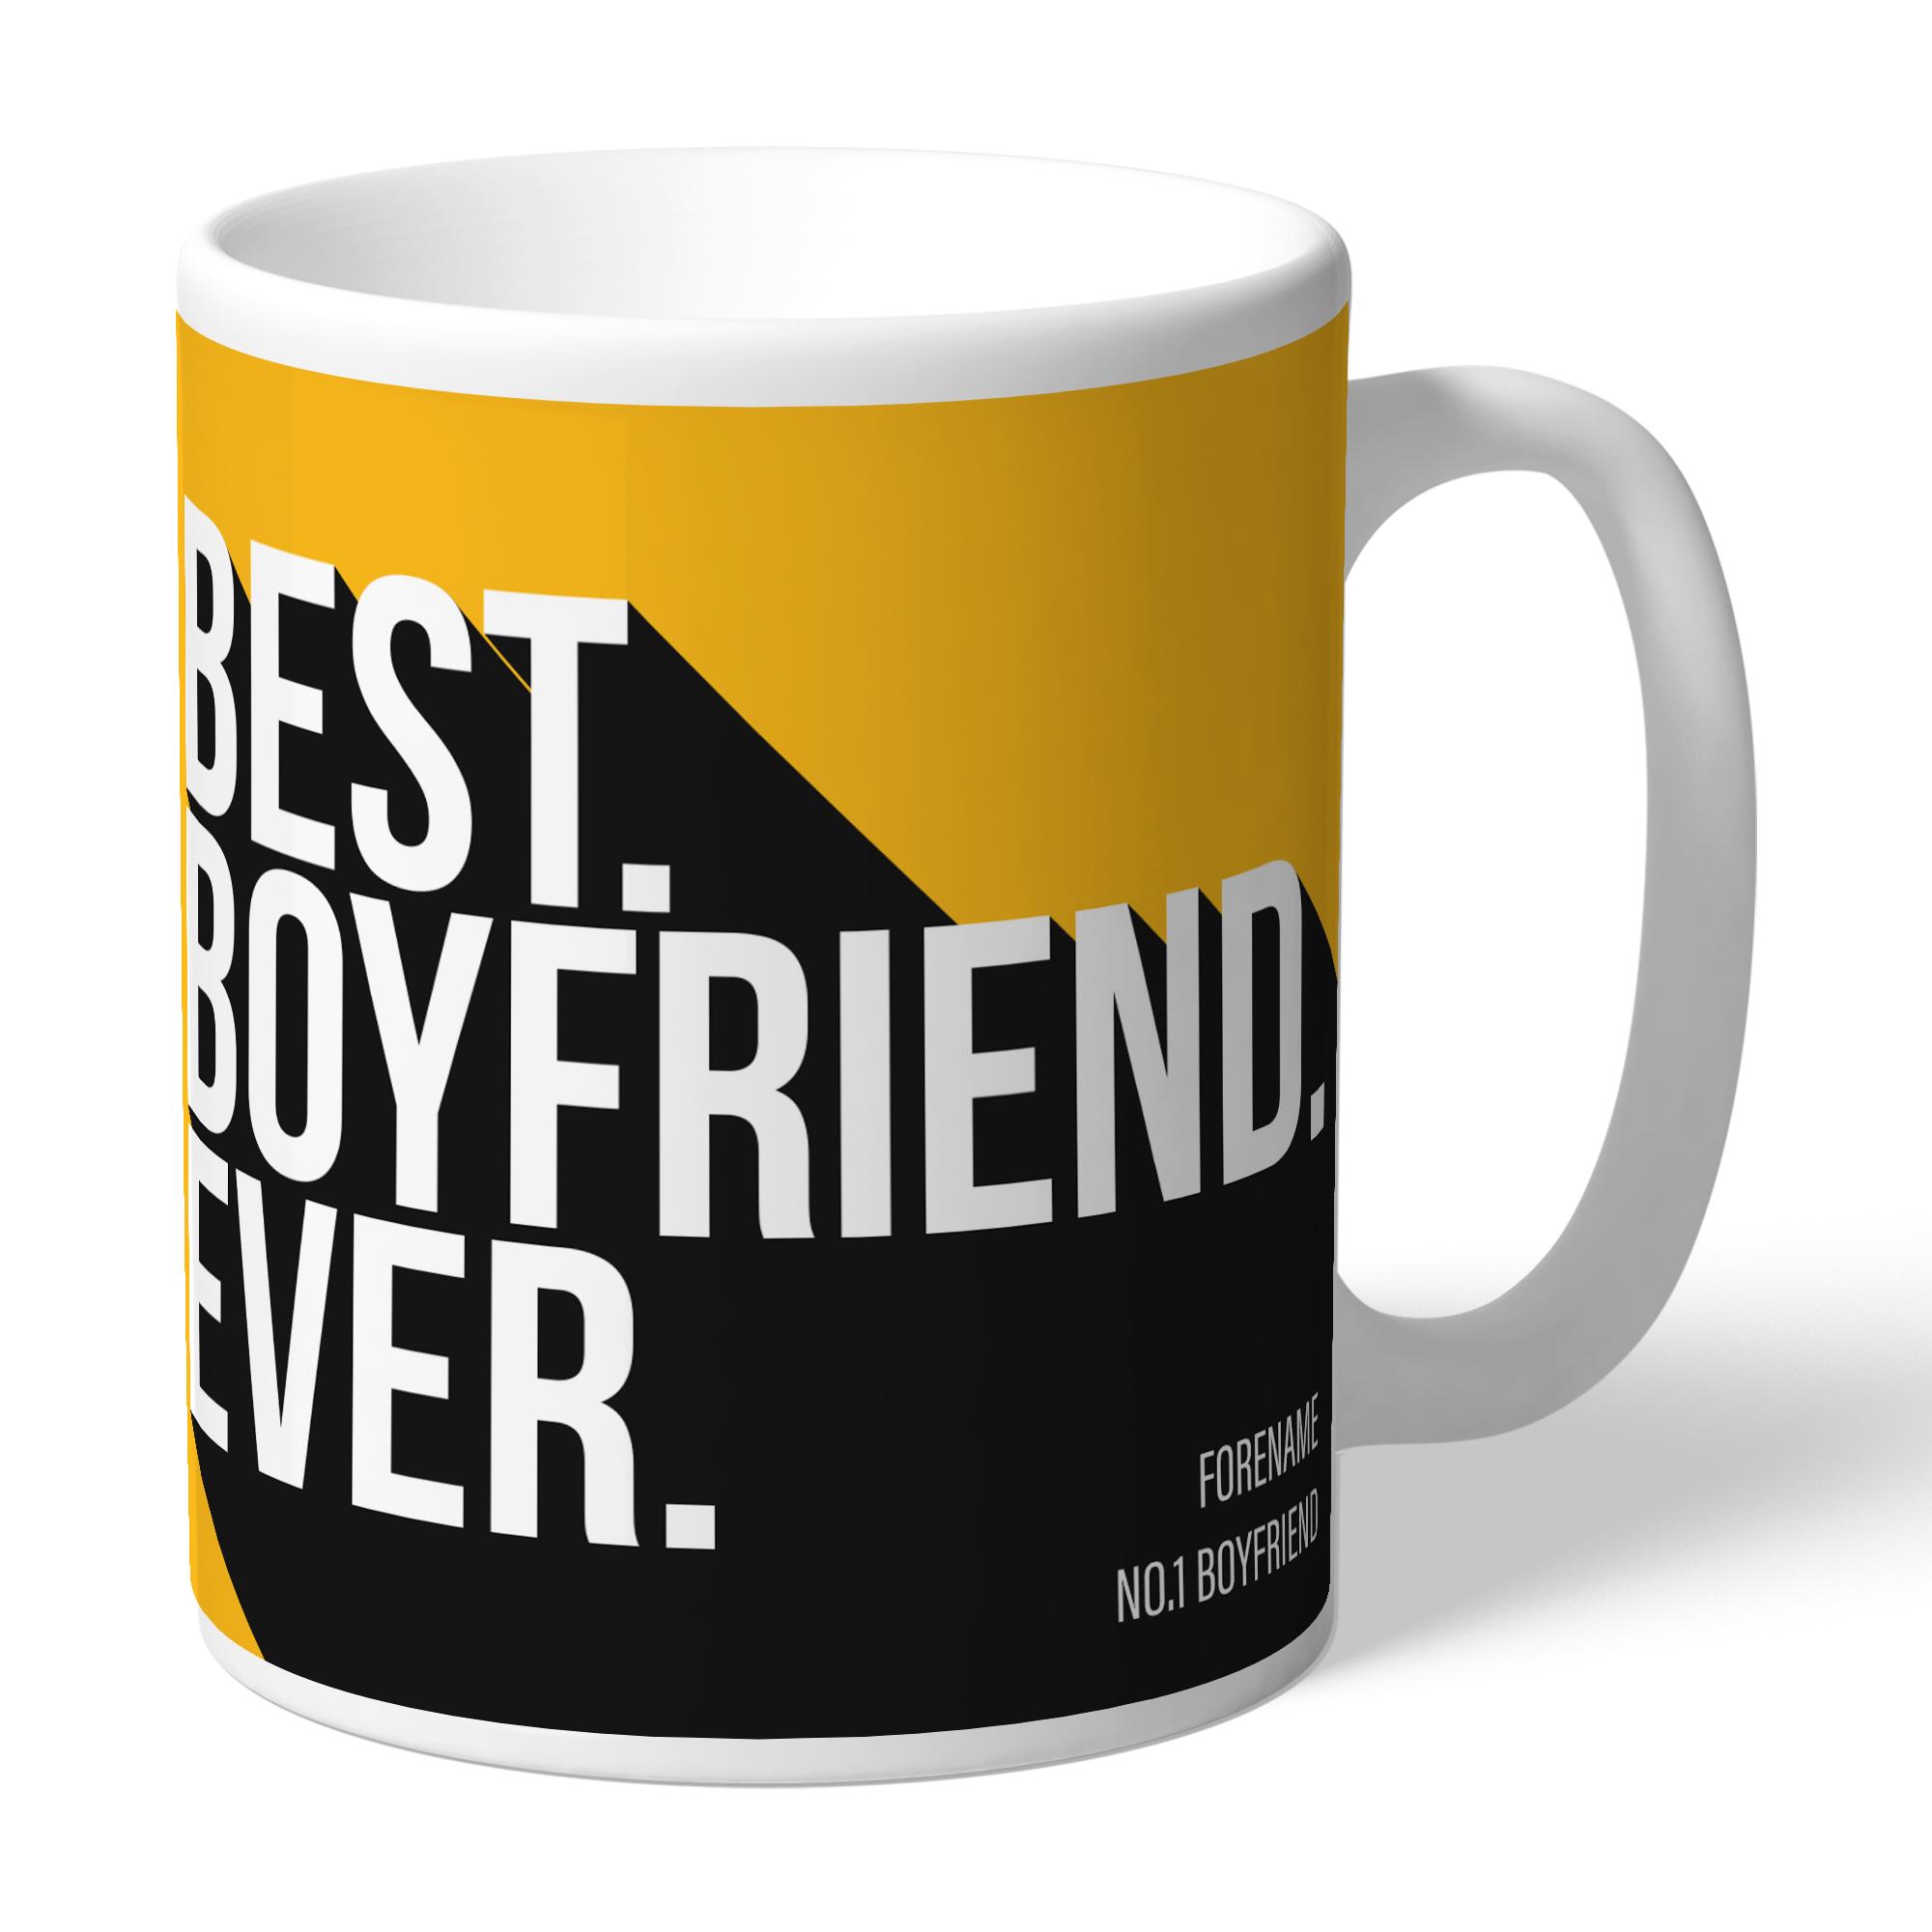 Wolverhampton Wanderers Best Boyfriend Ever Mug